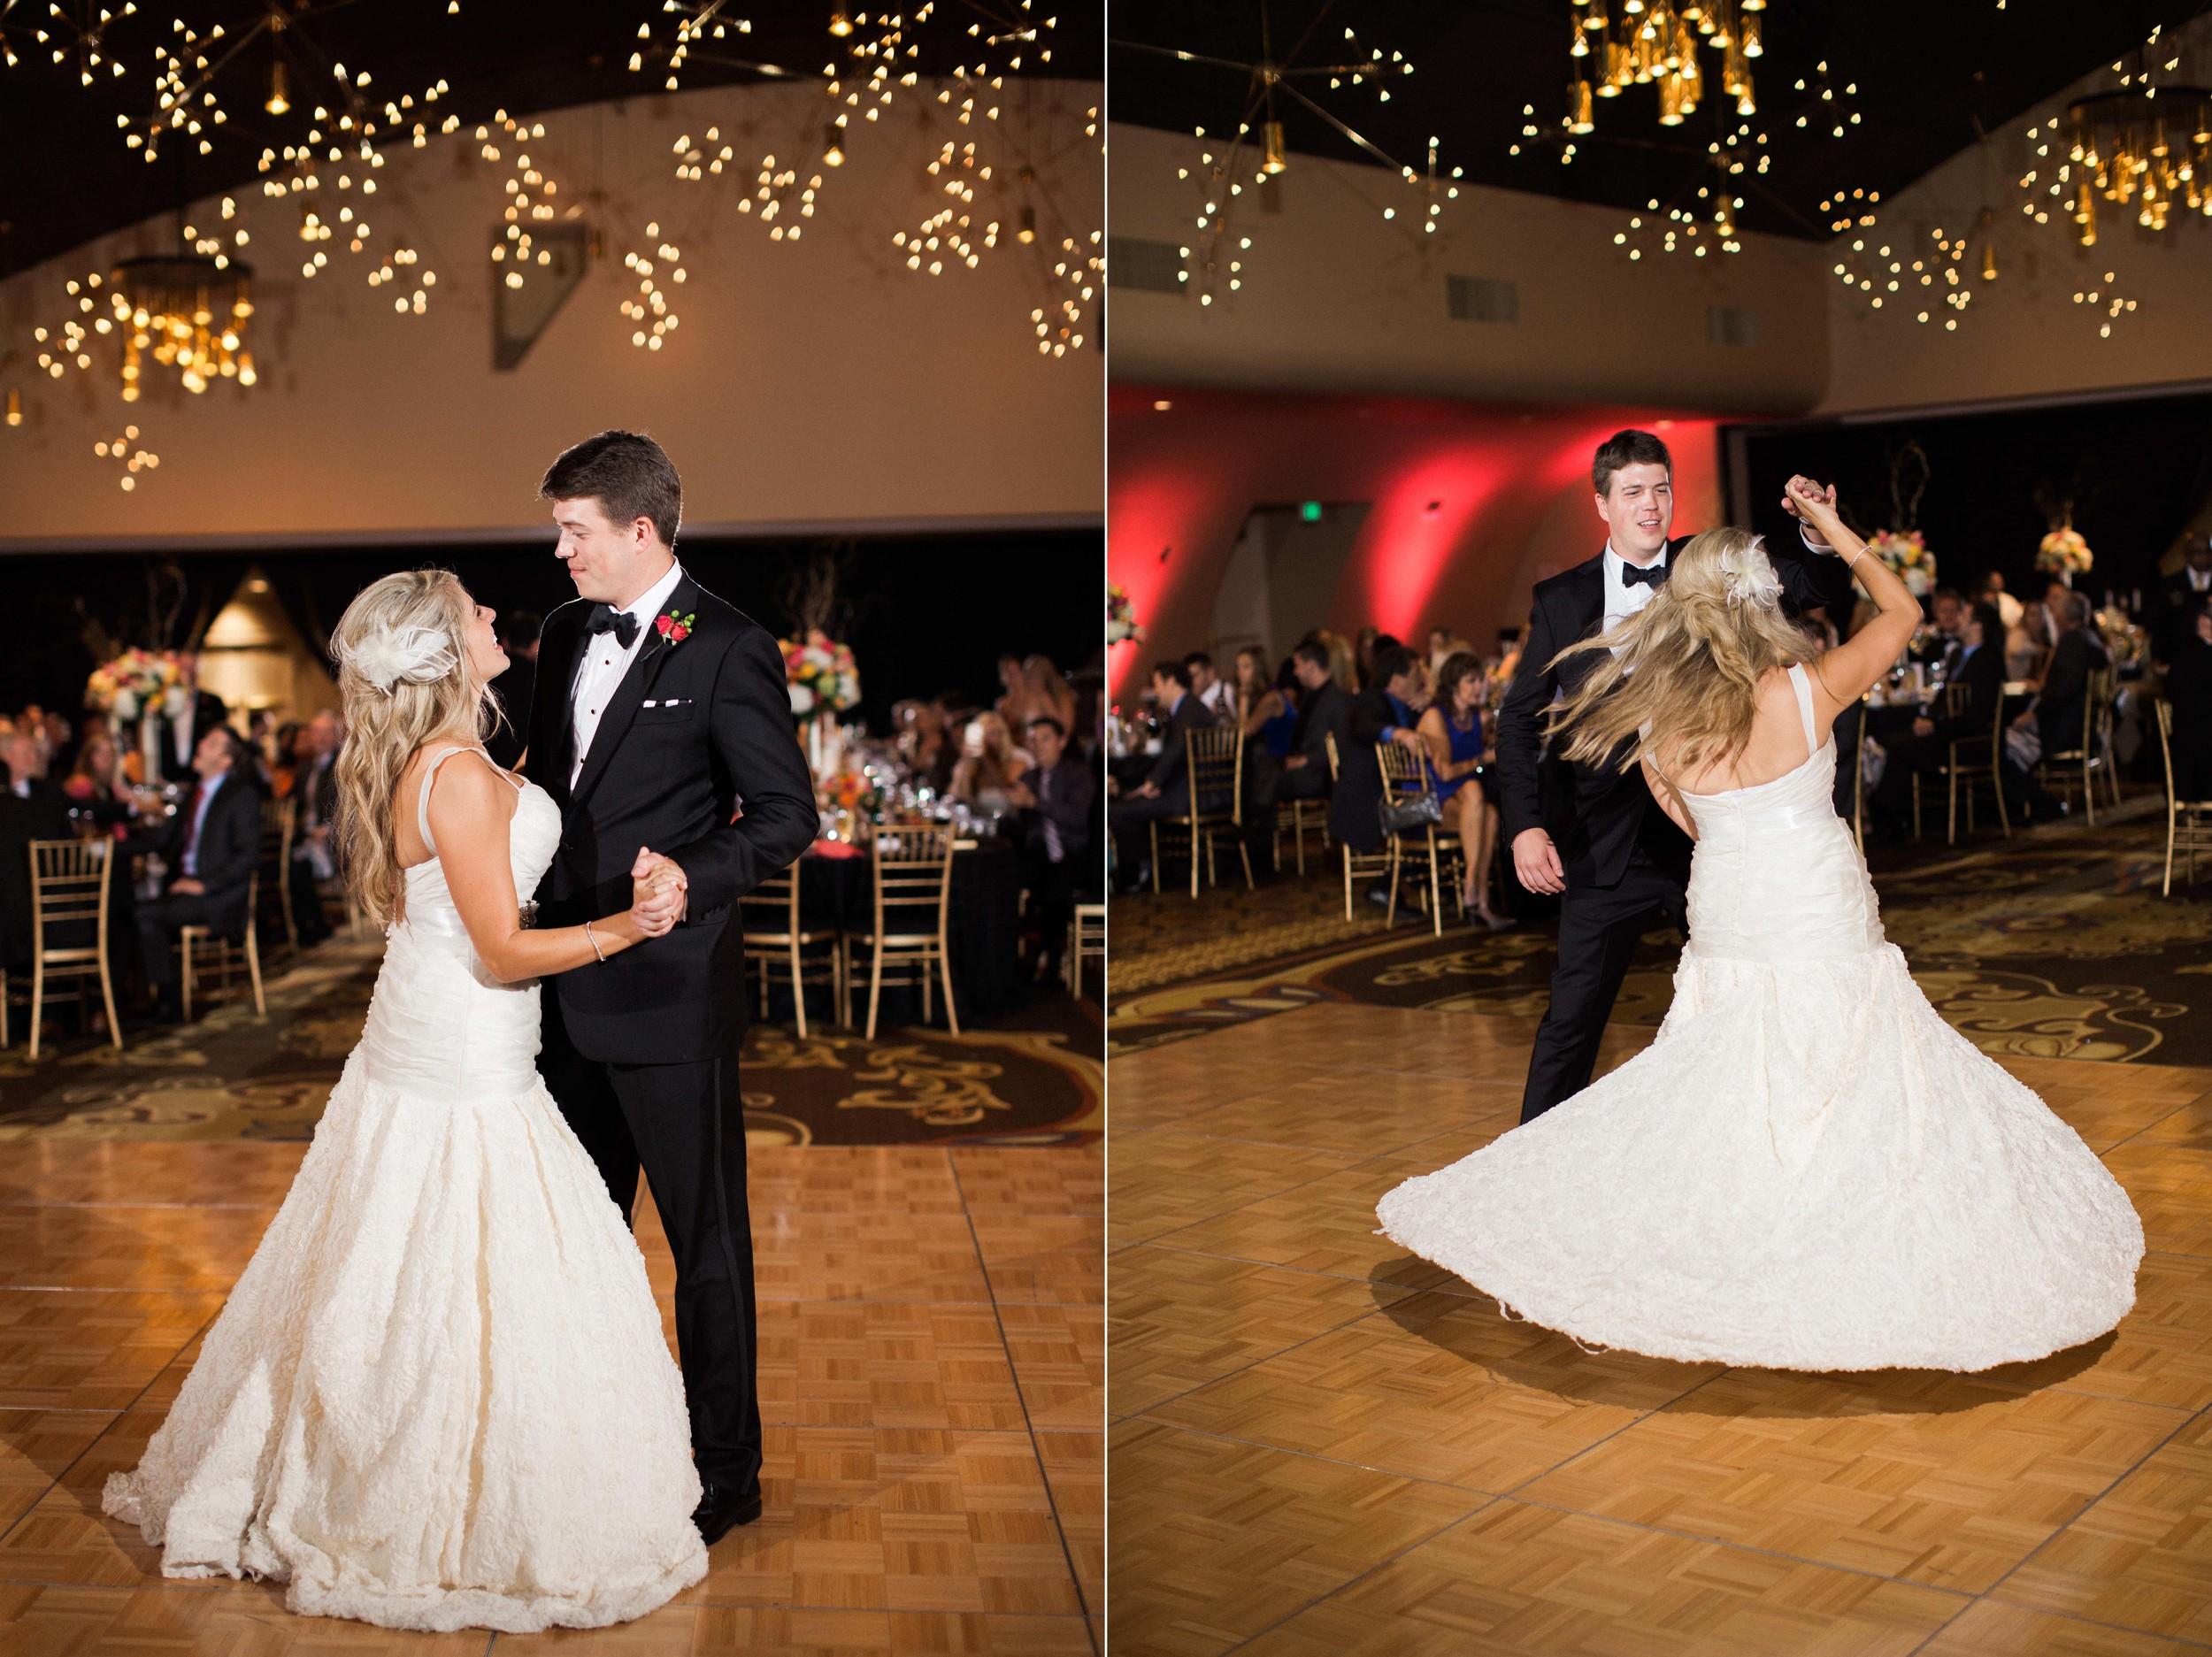 Chase Park Plaza St Louis Wedding Photo-1072 copy.jpg